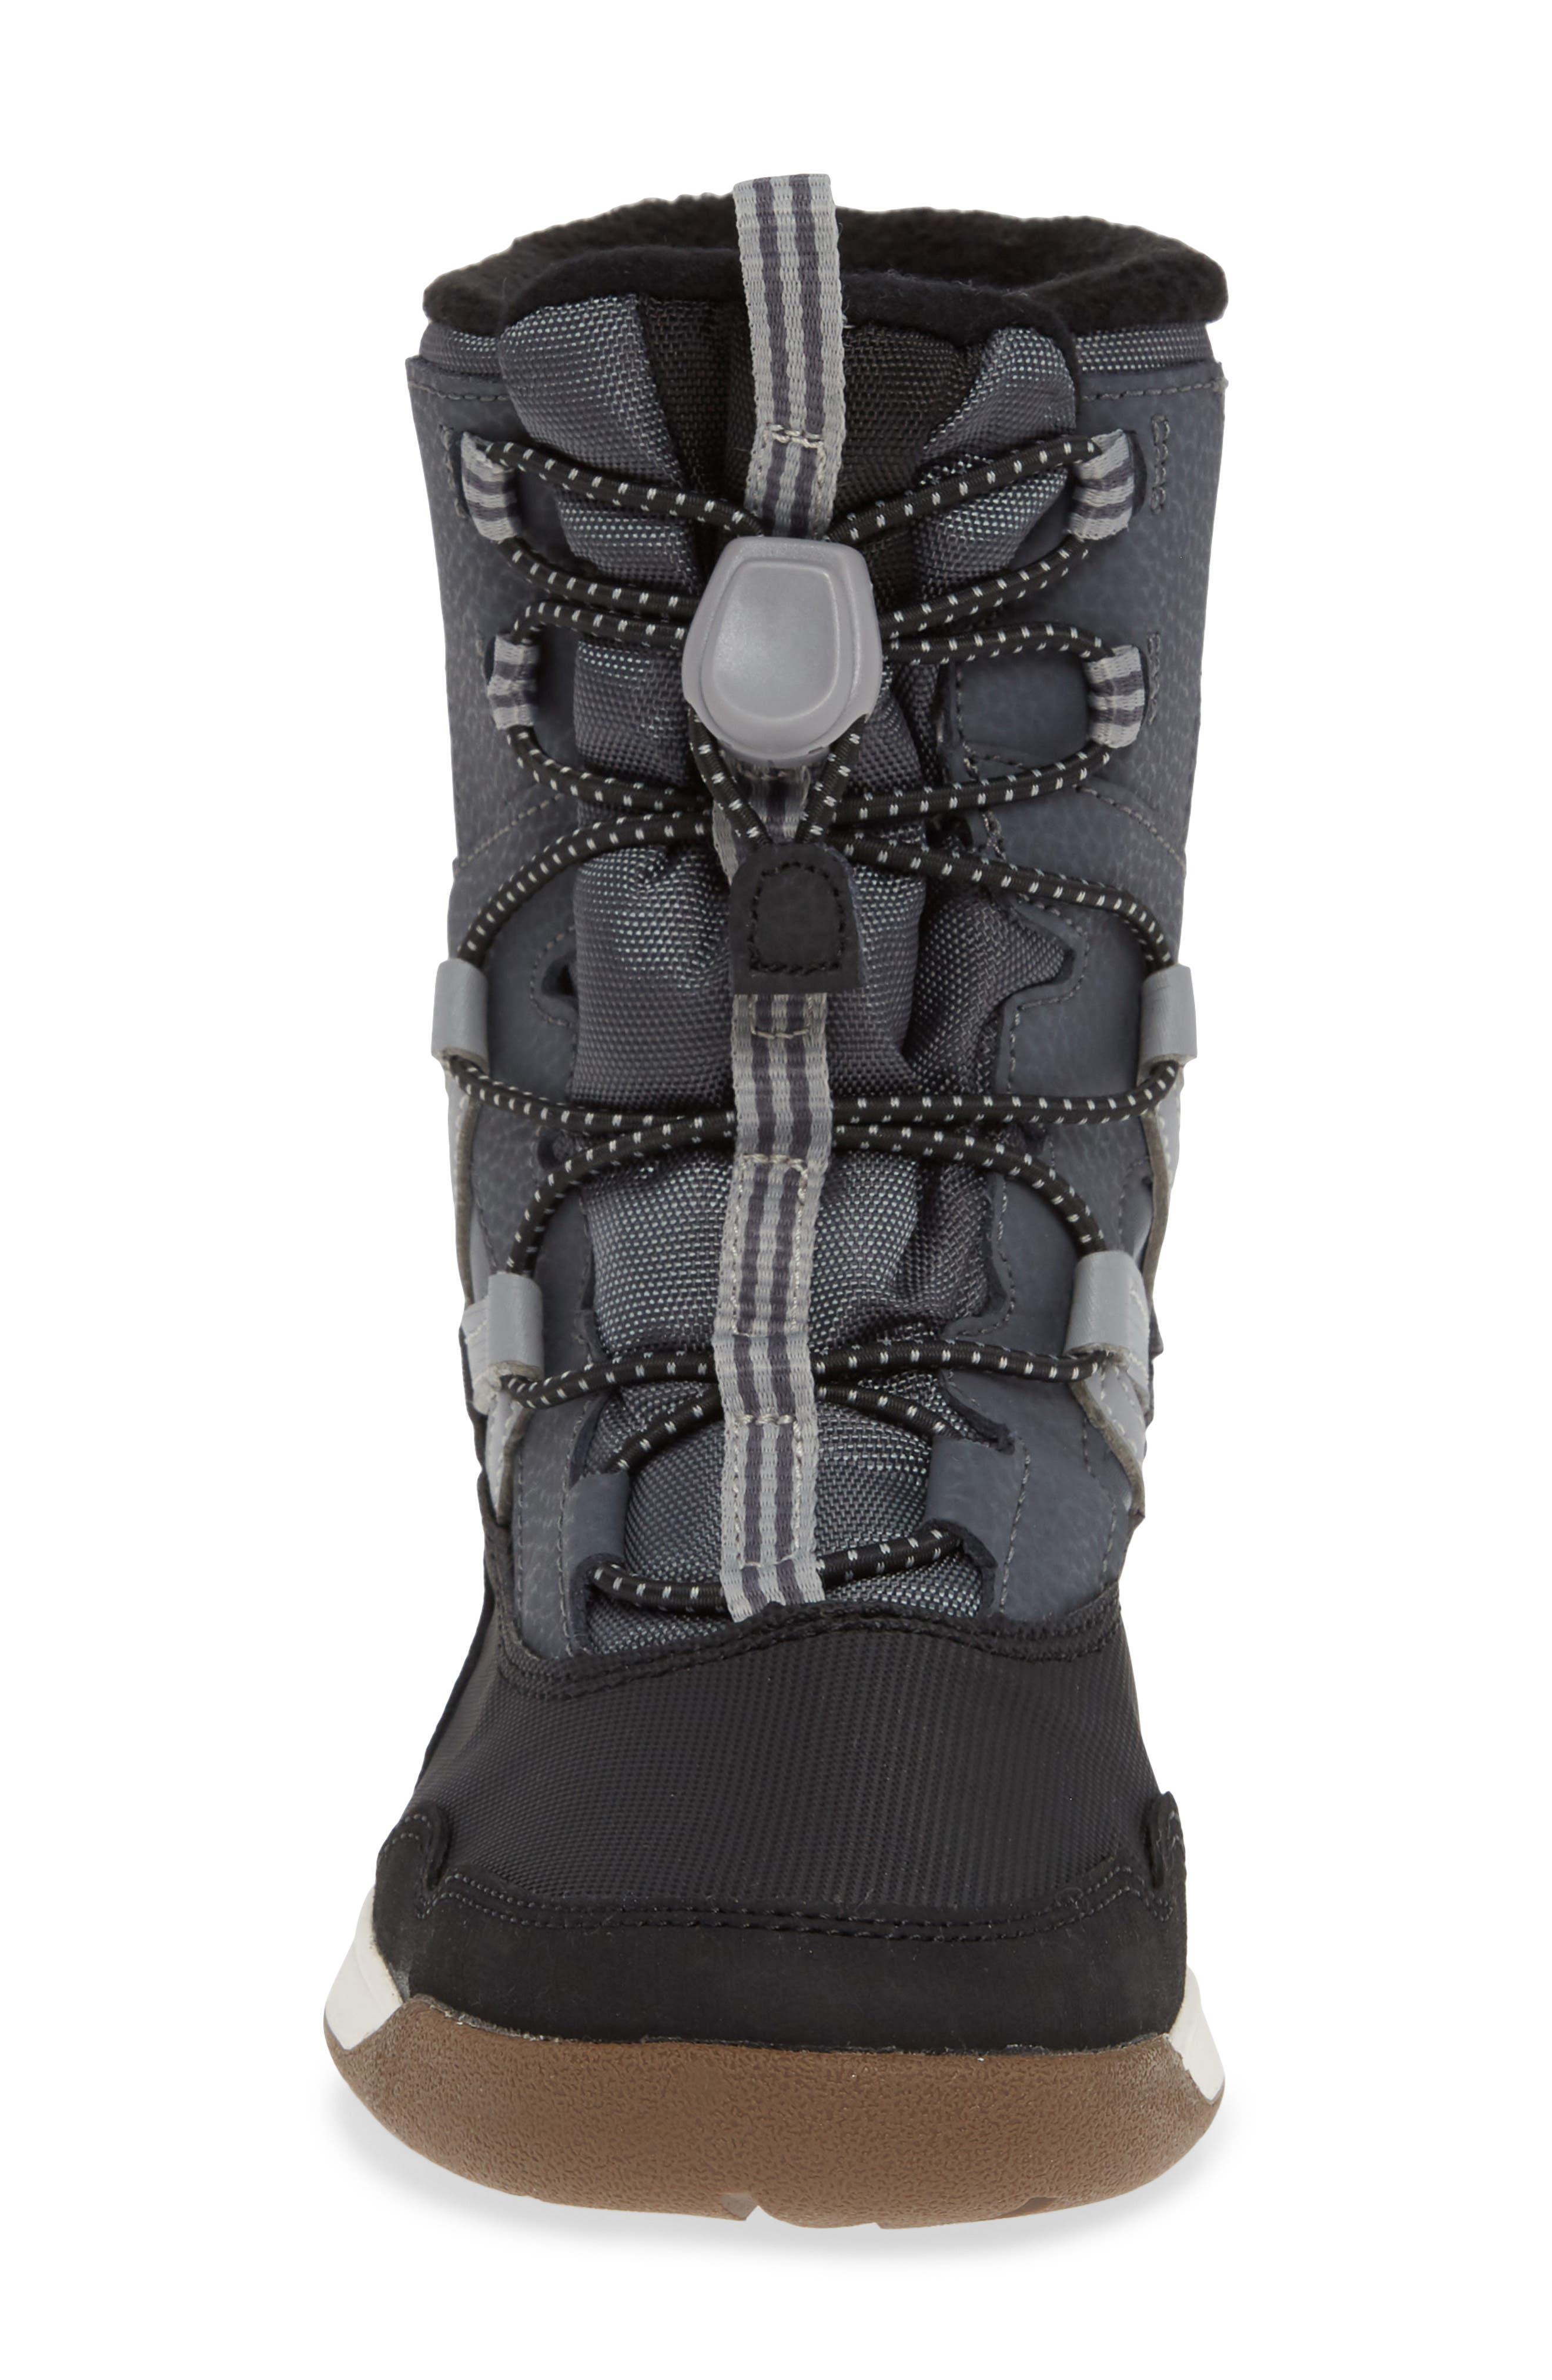 MERRELL, Snow Crush Waterproof Snow Boot, Alternate thumbnail 4, color, 020